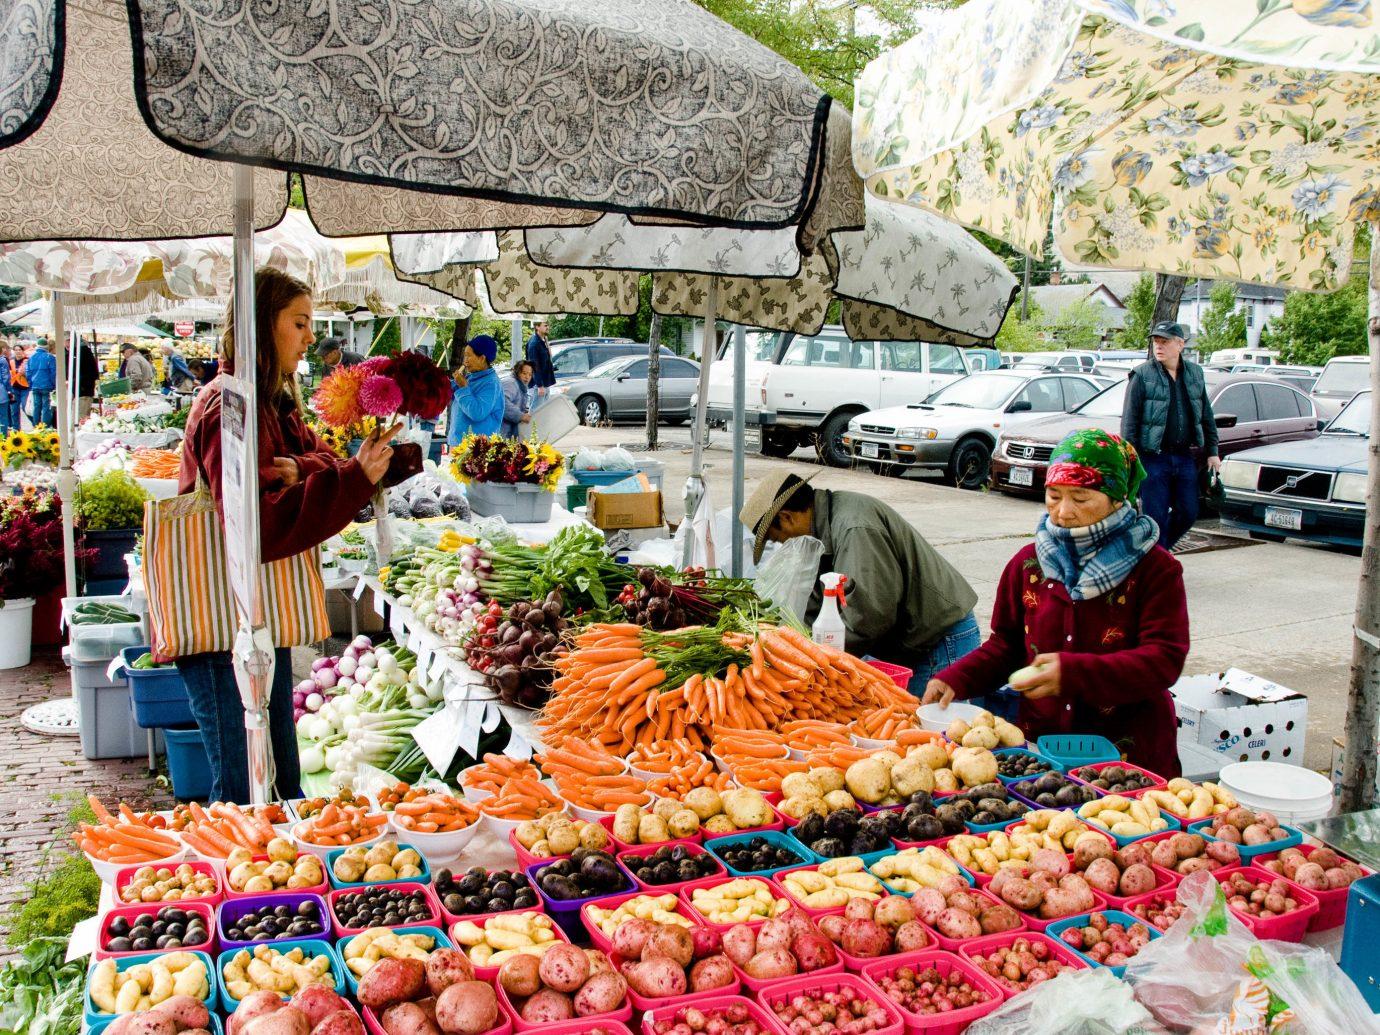 Trip Ideas marketplace market outdoor produce public space vendor stall bazaar scene food local food City fruit greengrocer vegetable brunch colorful fresh